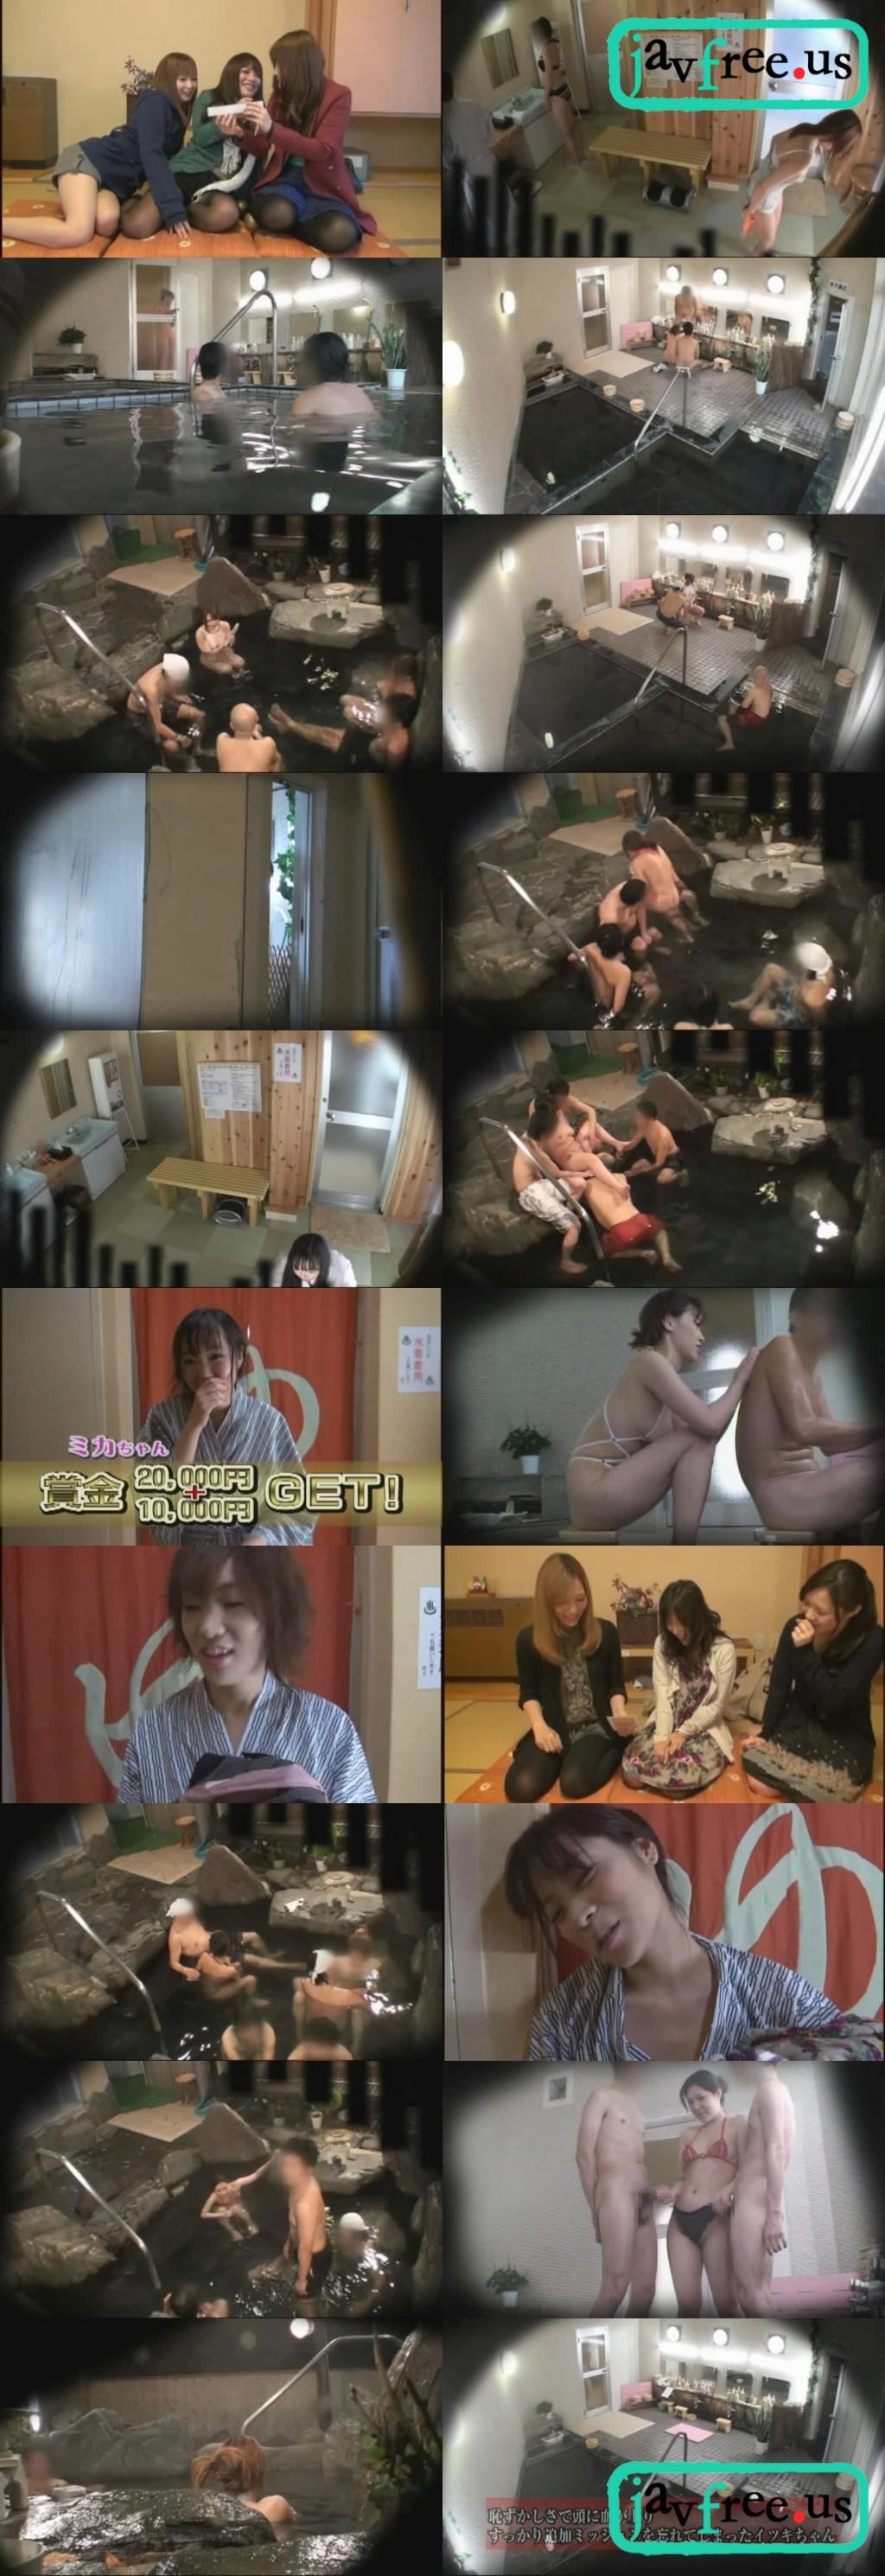 [SDMT 655] 群馬県伊香保温泉で見つけたお嬢さん 裸より恥ずかしい水着で混浴入ってみませんか? SDMT 655 SDMT